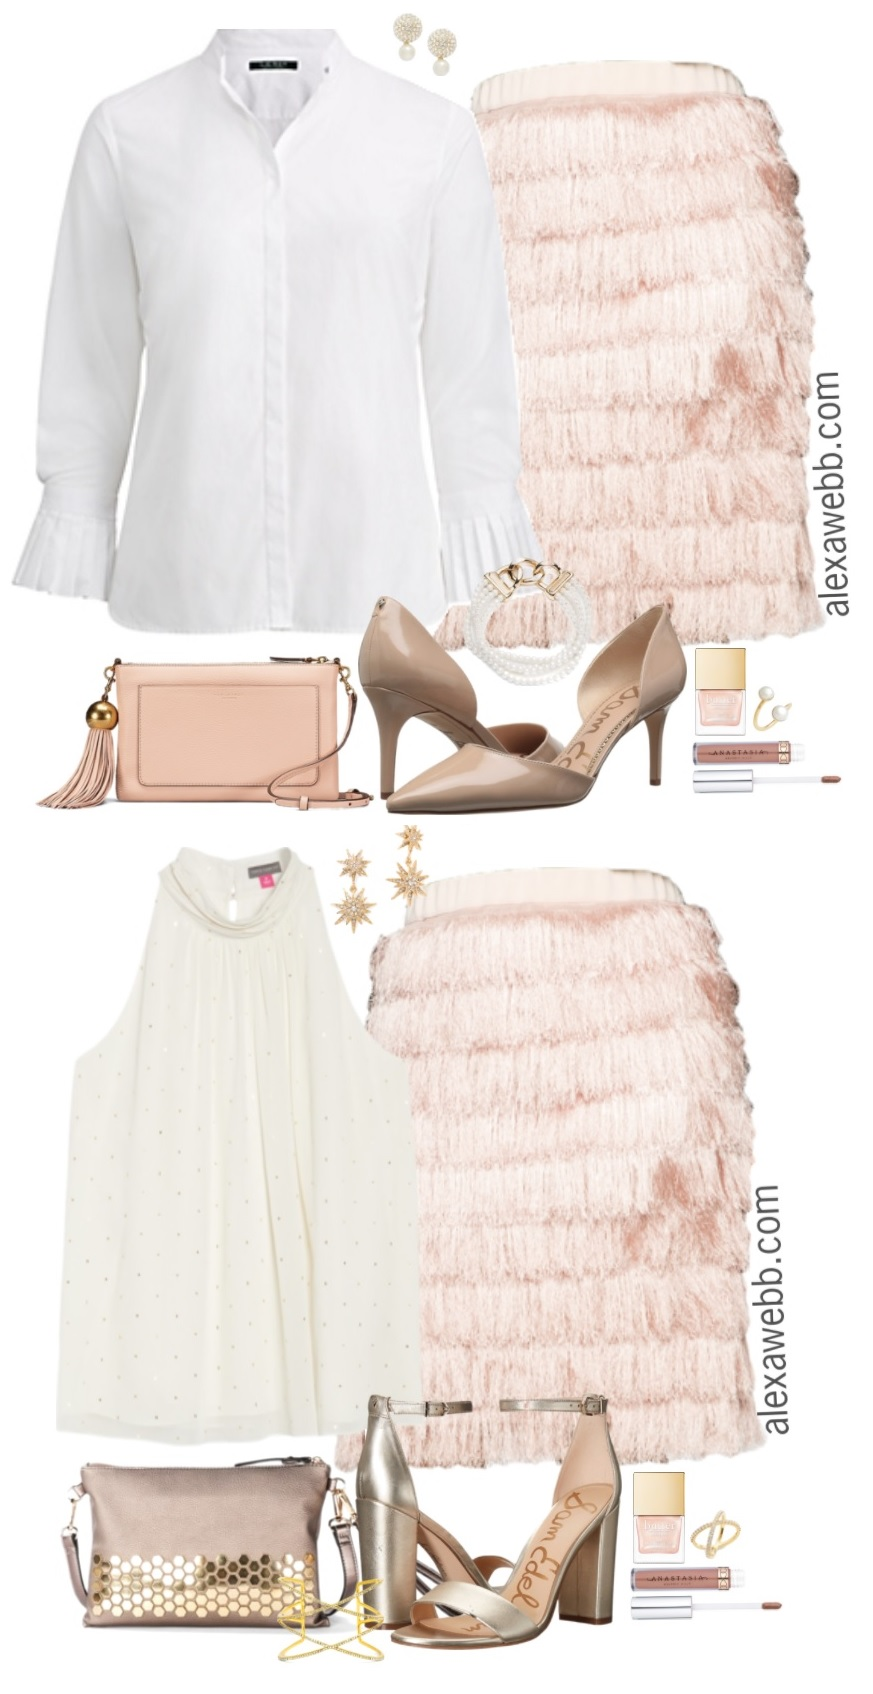 c307dd7c3 plus-size-fringe-skirt-outfit-alexa-webb-1217-3 - Alexa Webb